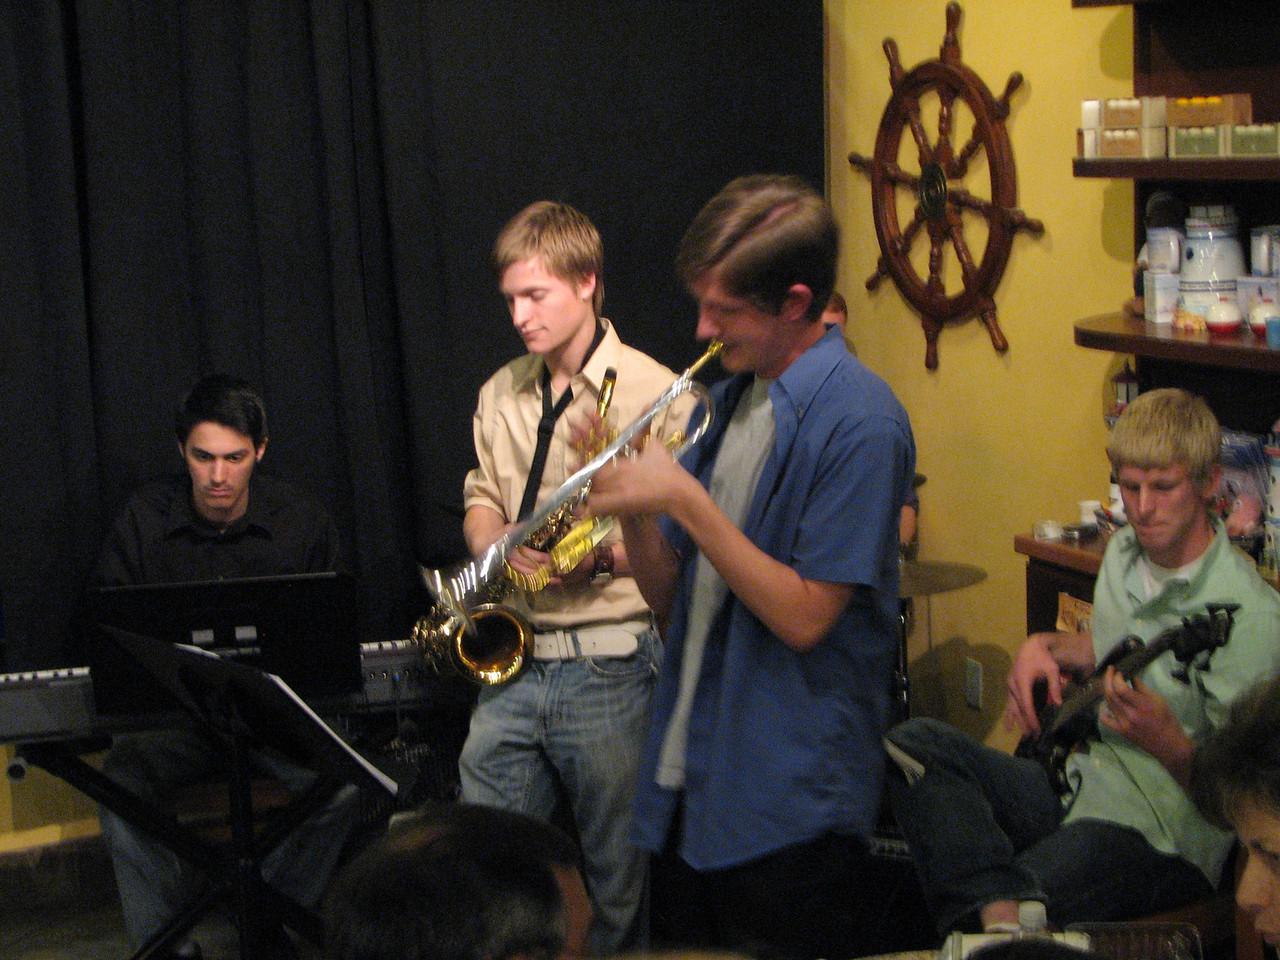 2008 03 19 Wed - Trevor Gomes et al  jazz combo @ The Big Straw 1